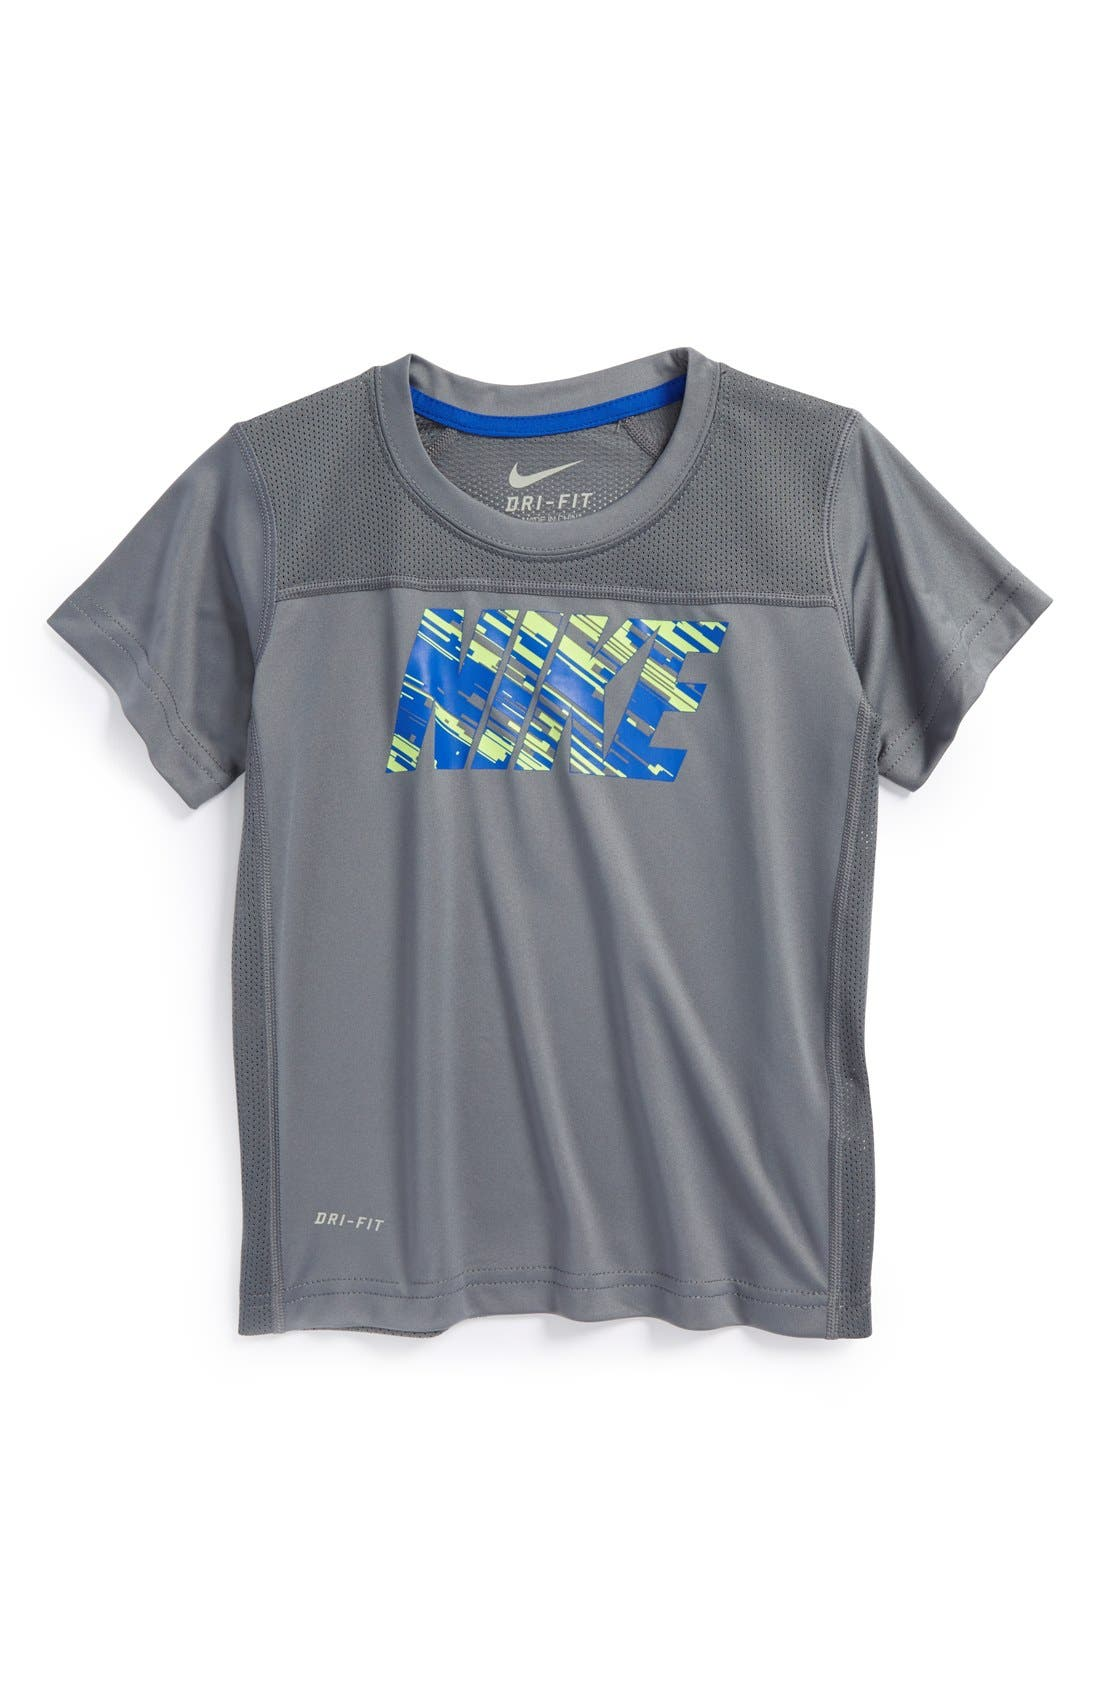 Main Image - Nike 'Hyper Speed GFX' Mesh Panel Short Sleeve T-Shirt (Toddler Boys)